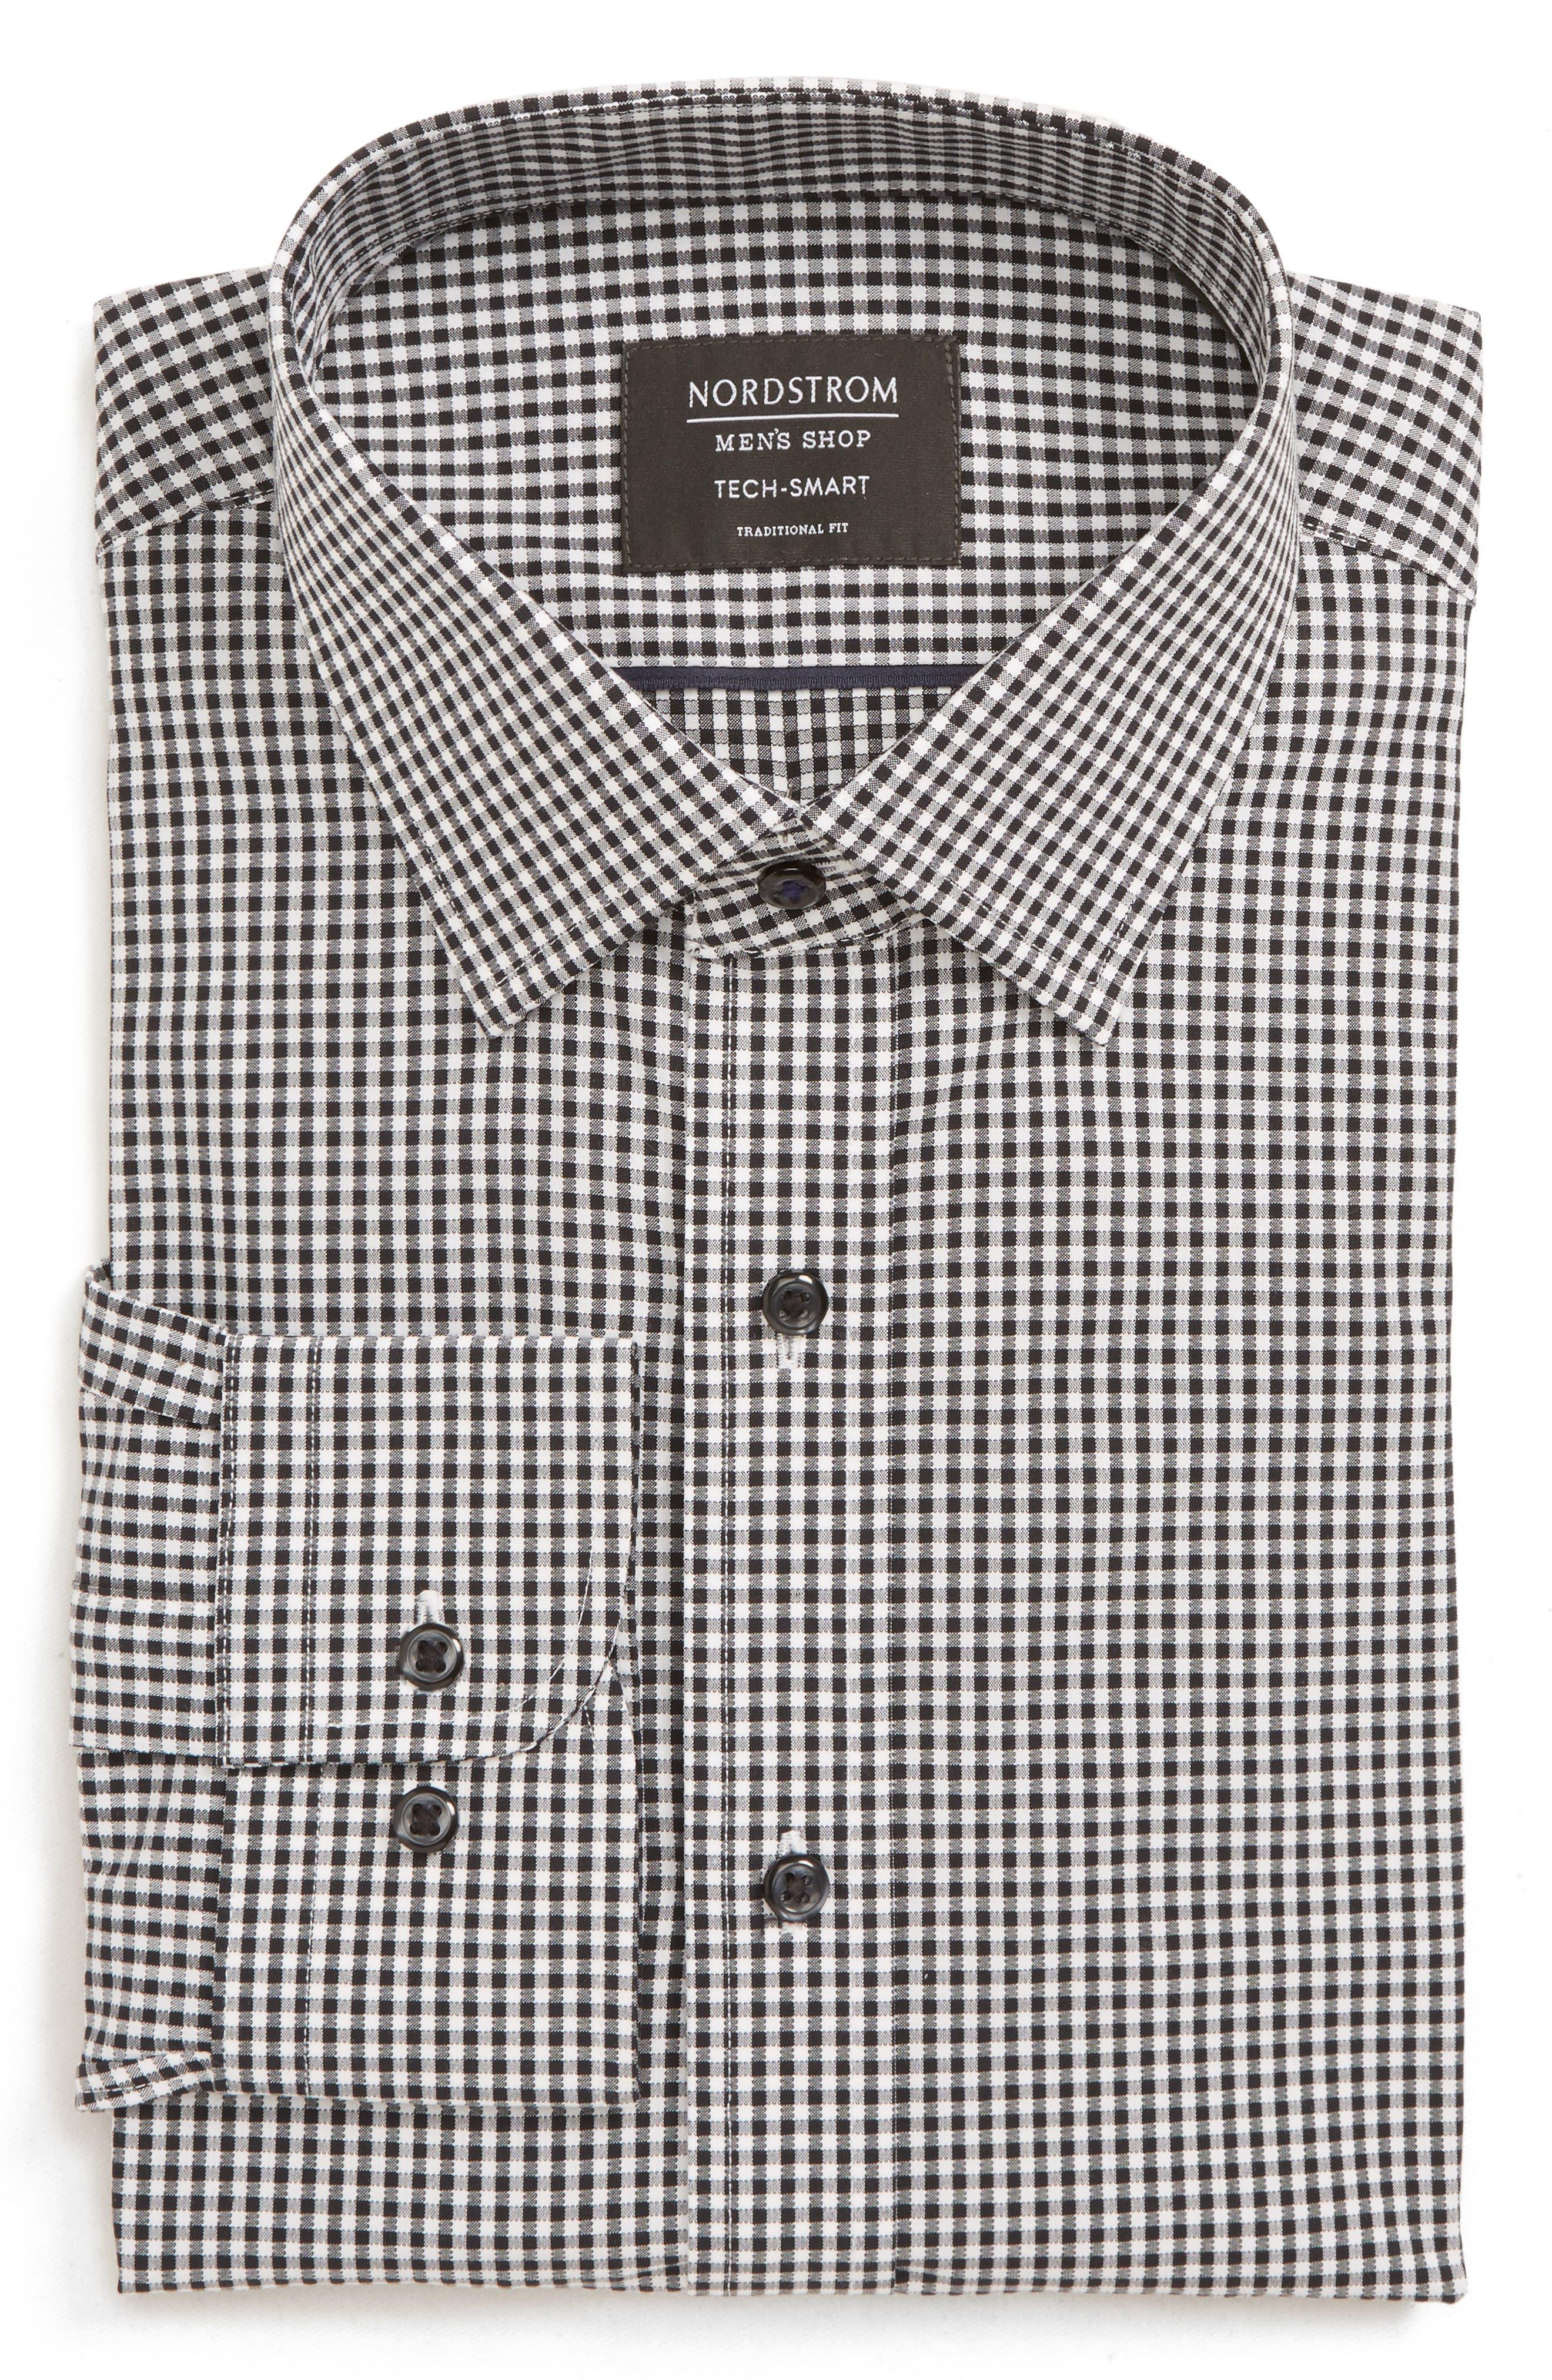 Tech-Smart Traditional Fit Check Stretch Dress Shirt,                         Main,                         color, BLACK ROCK